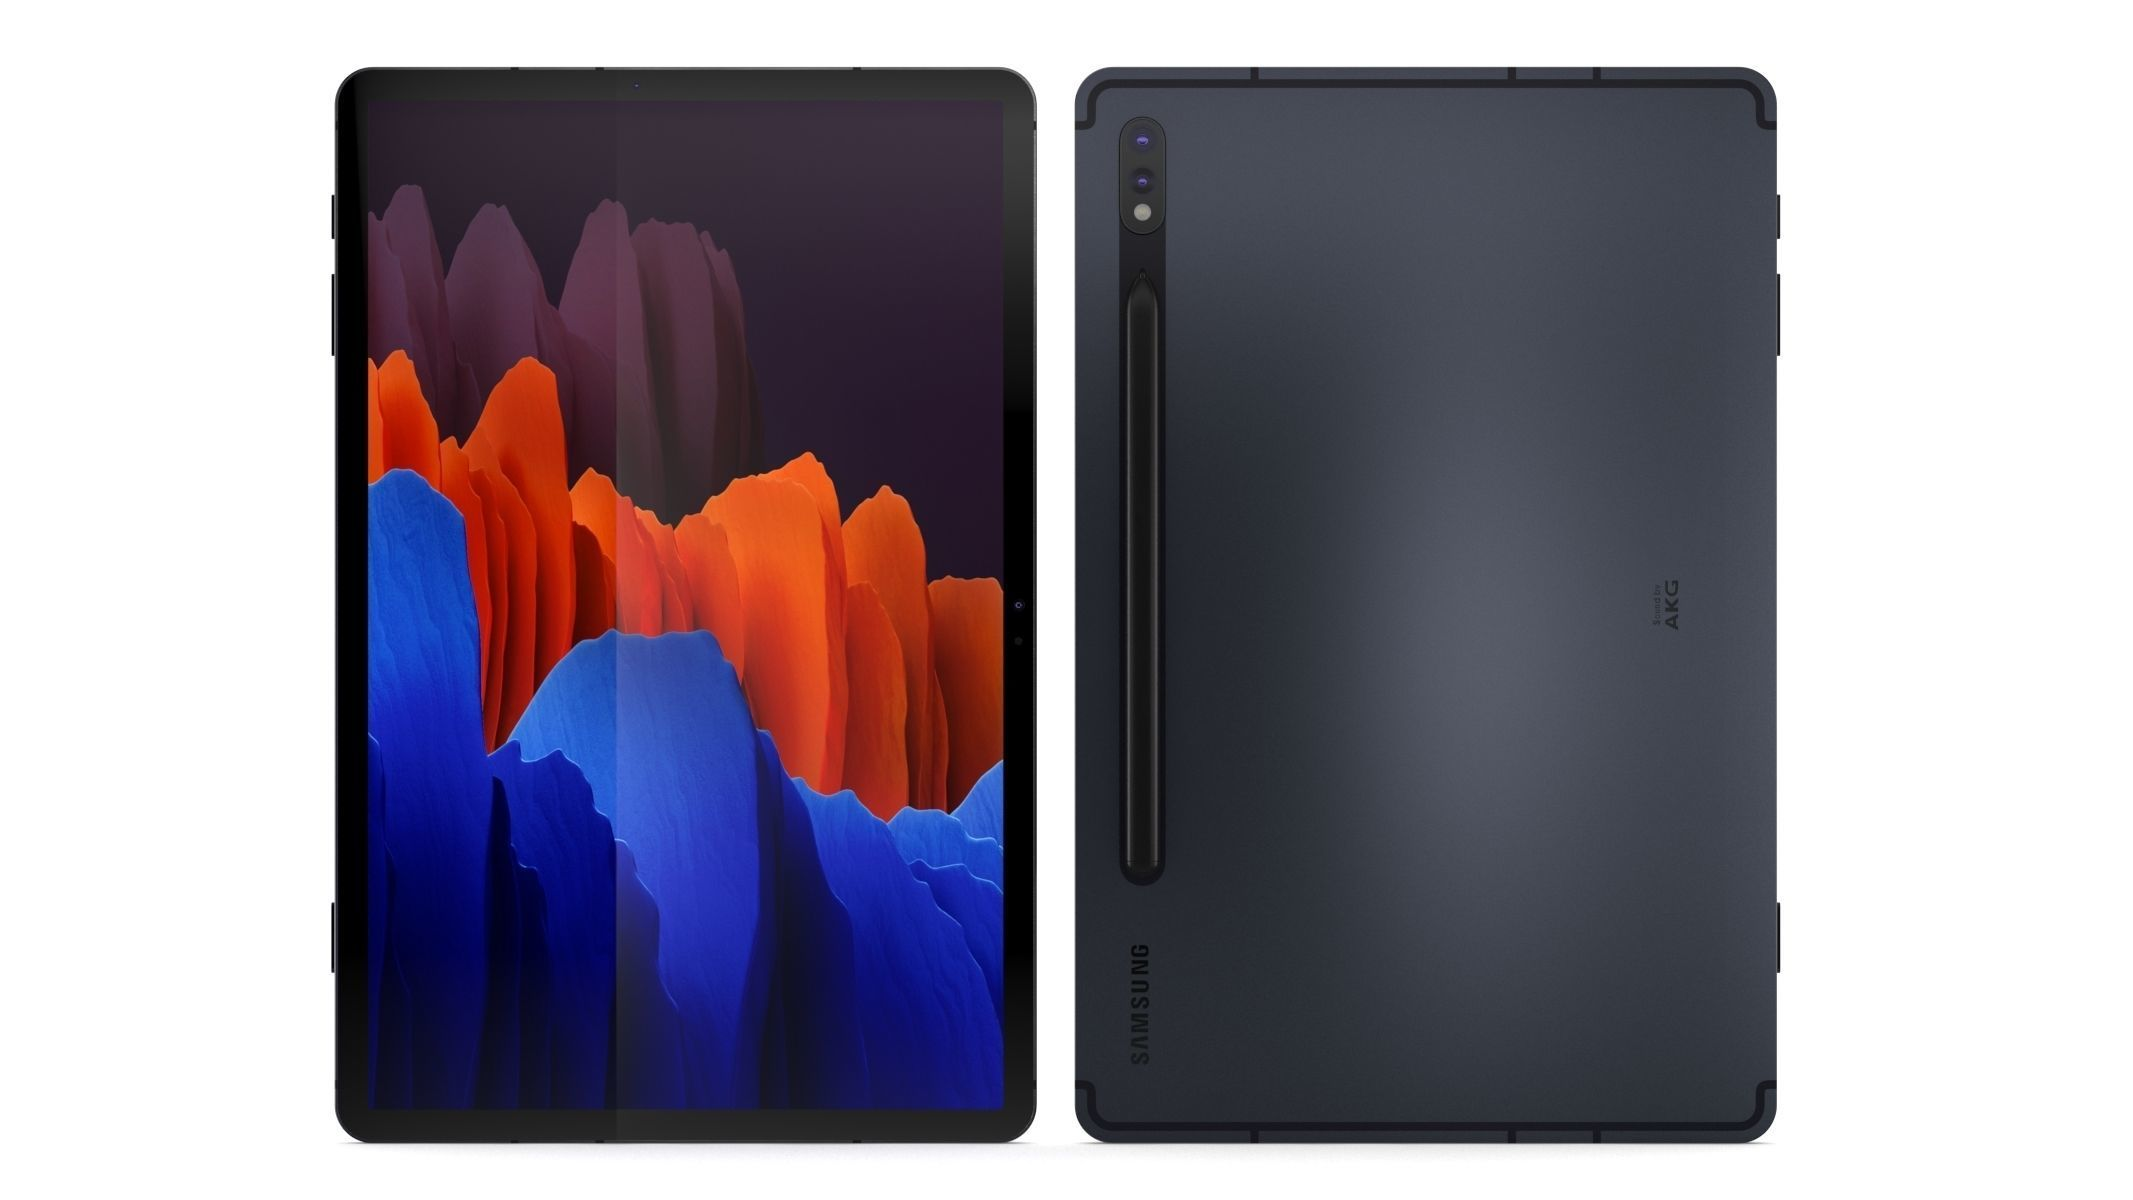 Galaxy Tab S7 Mystic Black